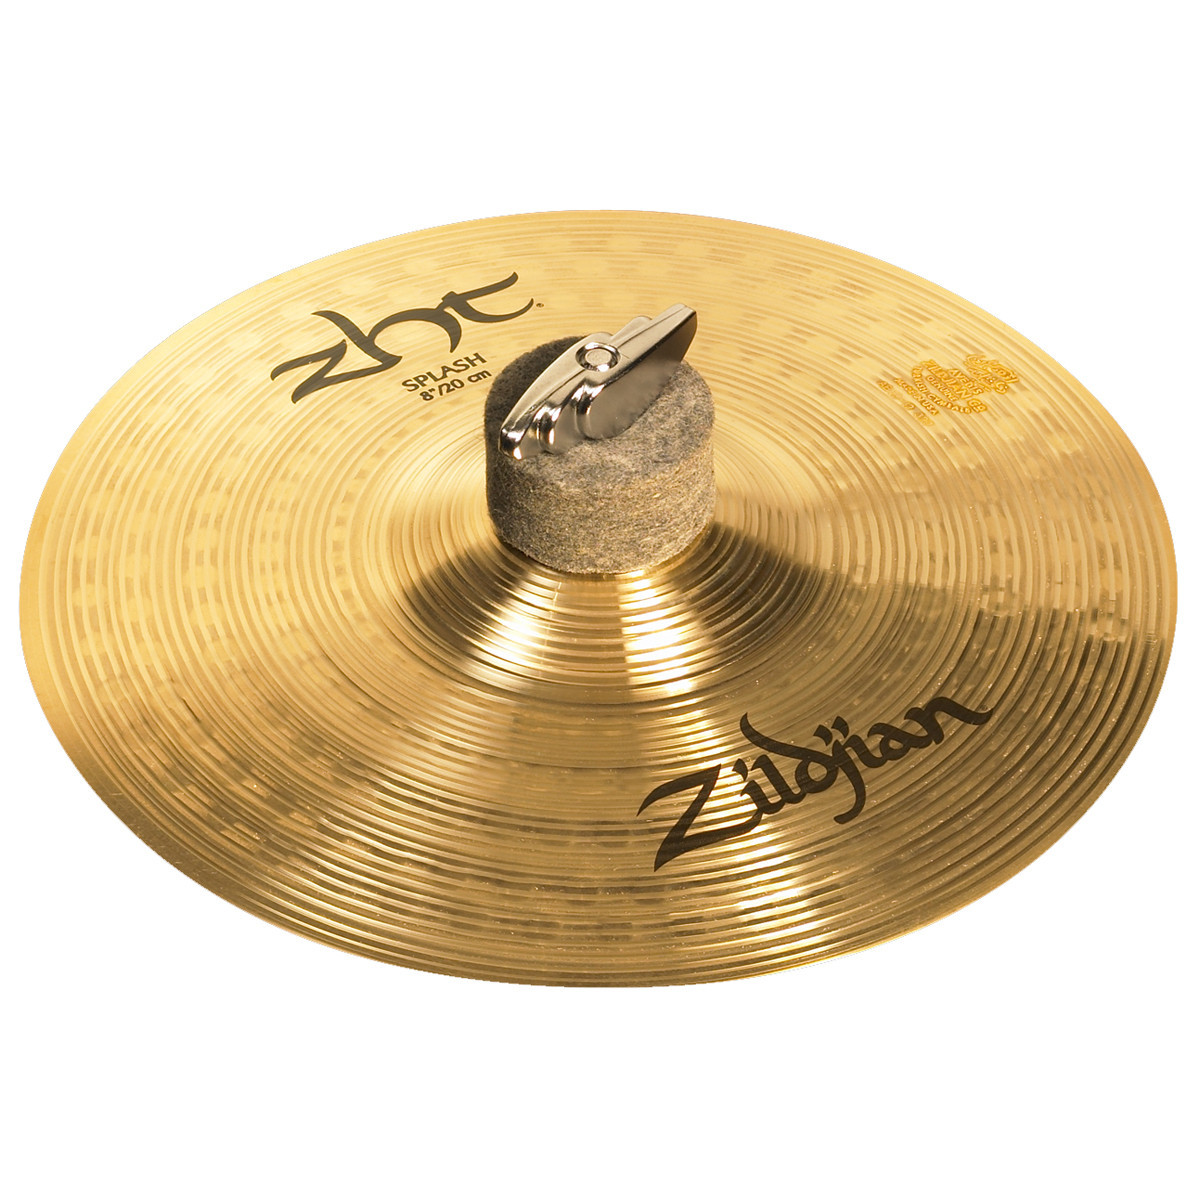 disc zildjian zht 8 39 39 splash cymbal at gear4music. Black Bedroom Furniture Sets. Home Design Ideas